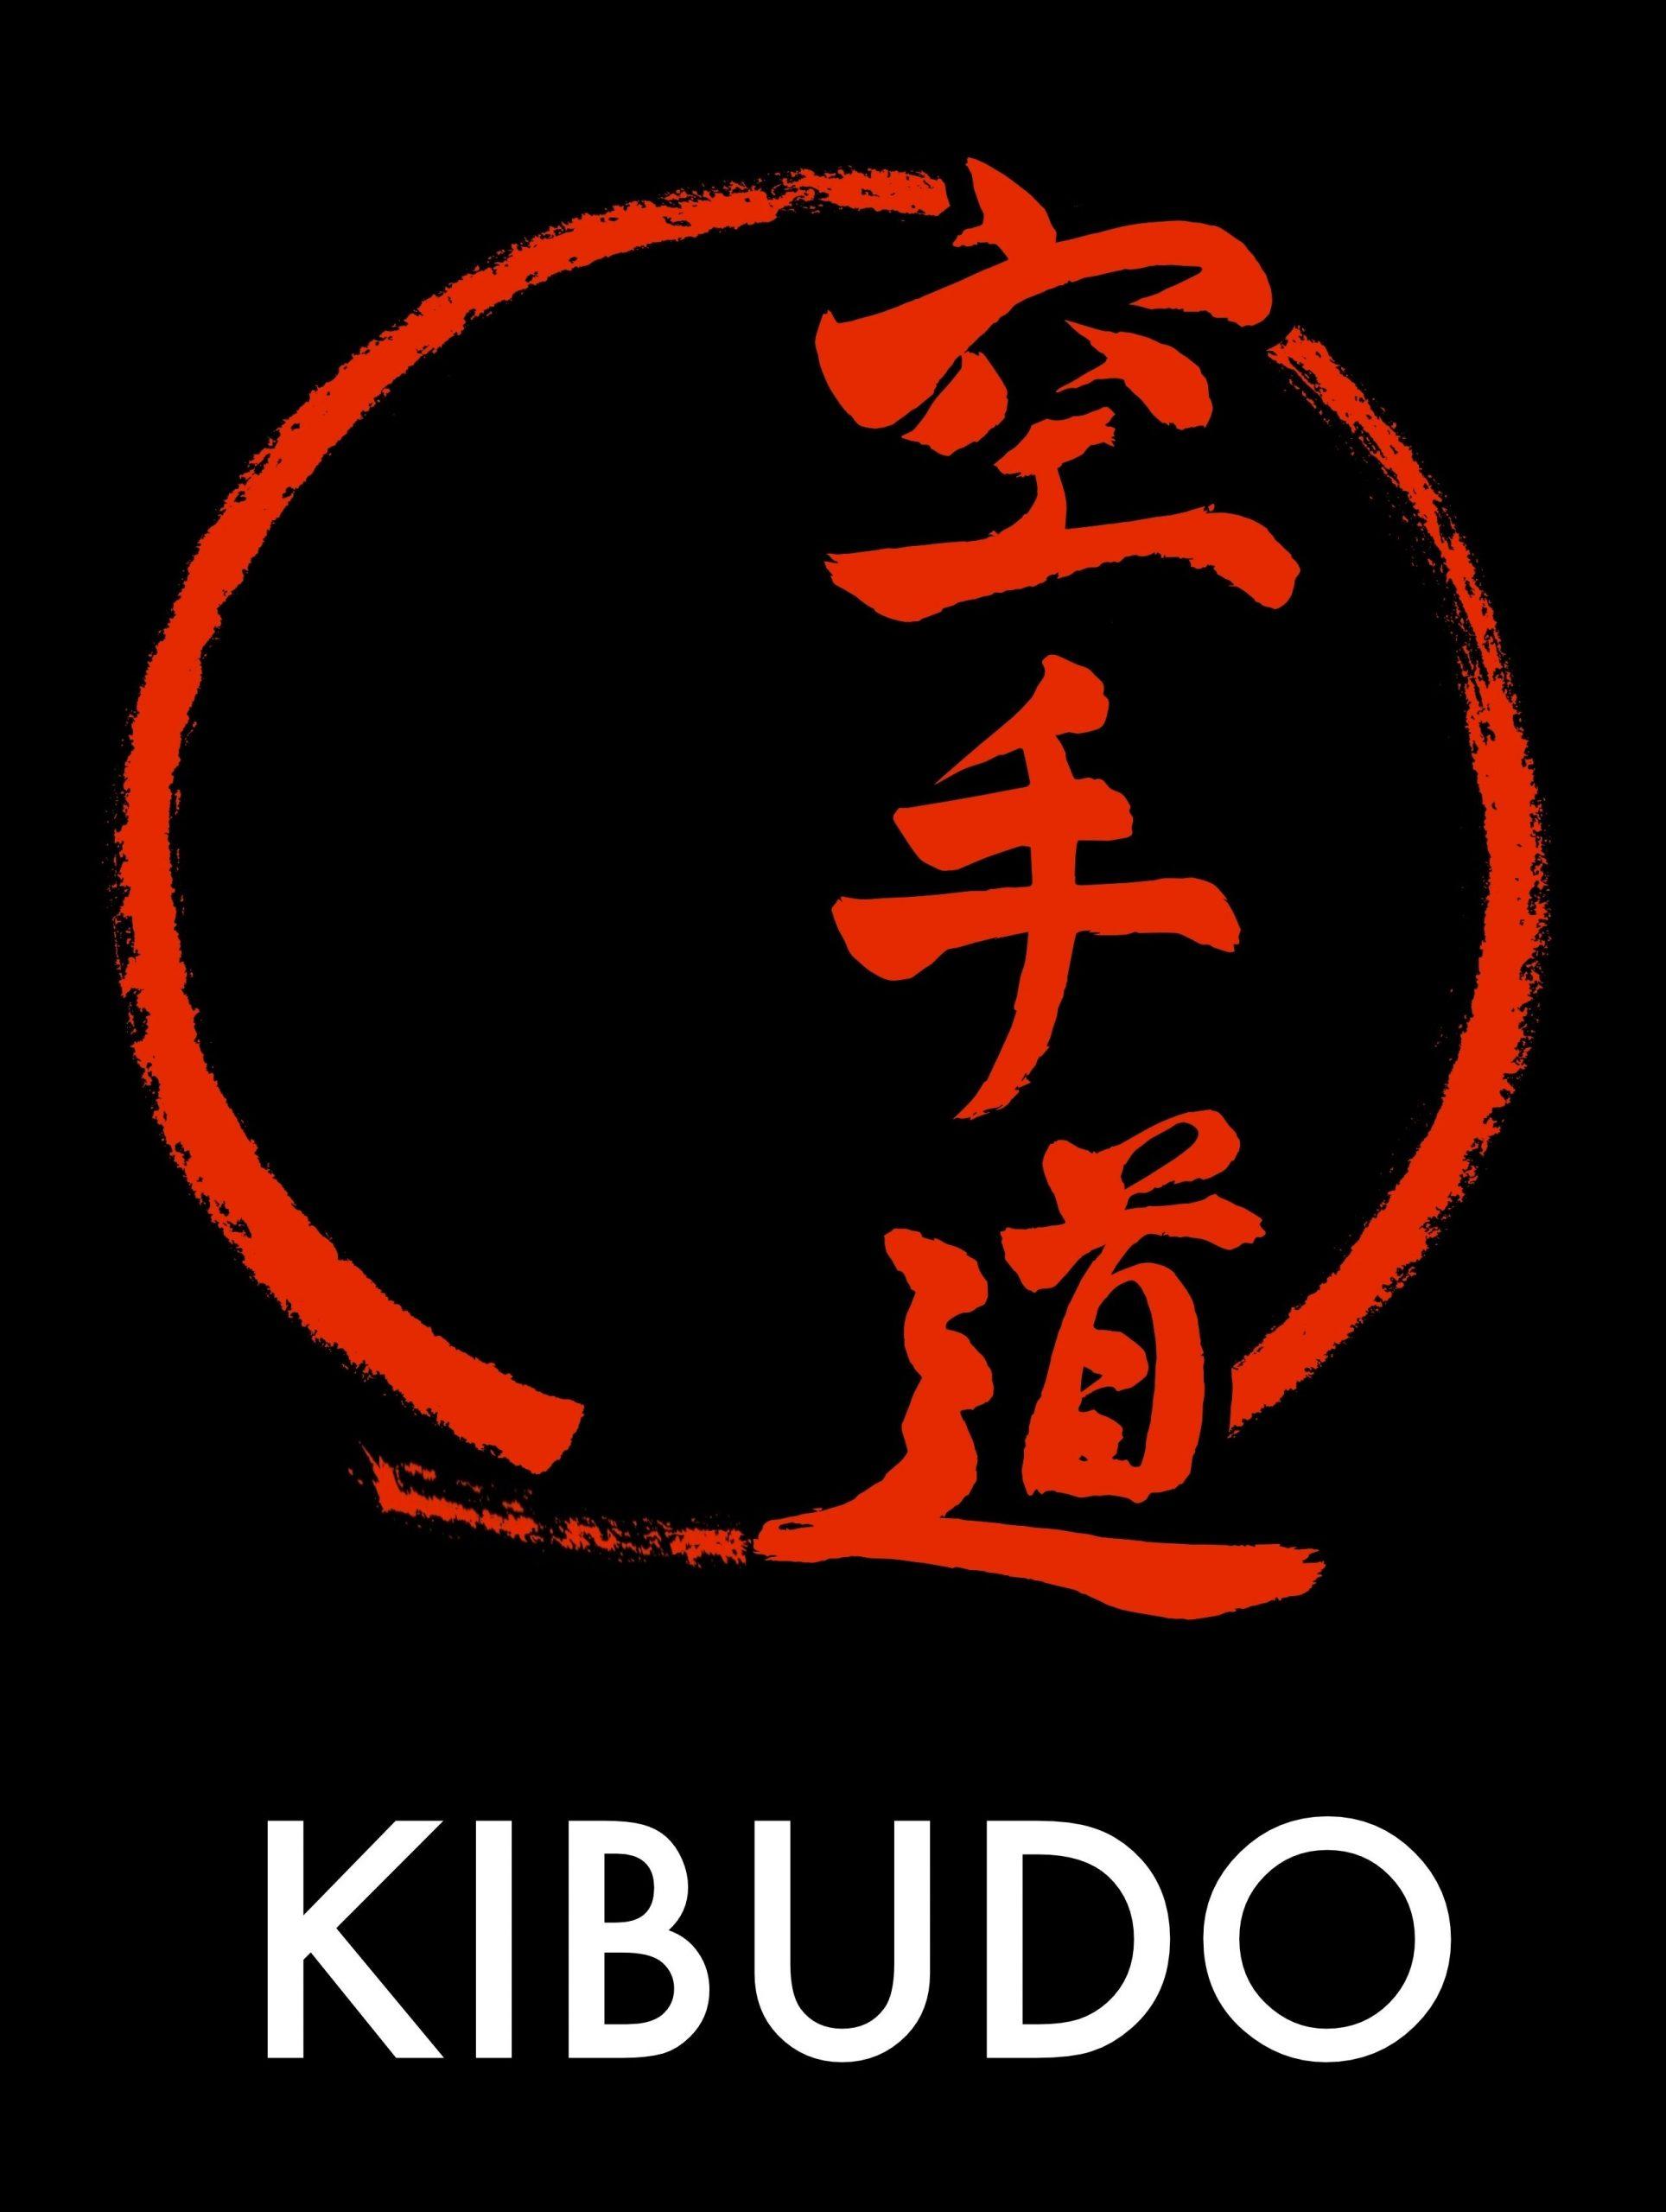 Kibudo